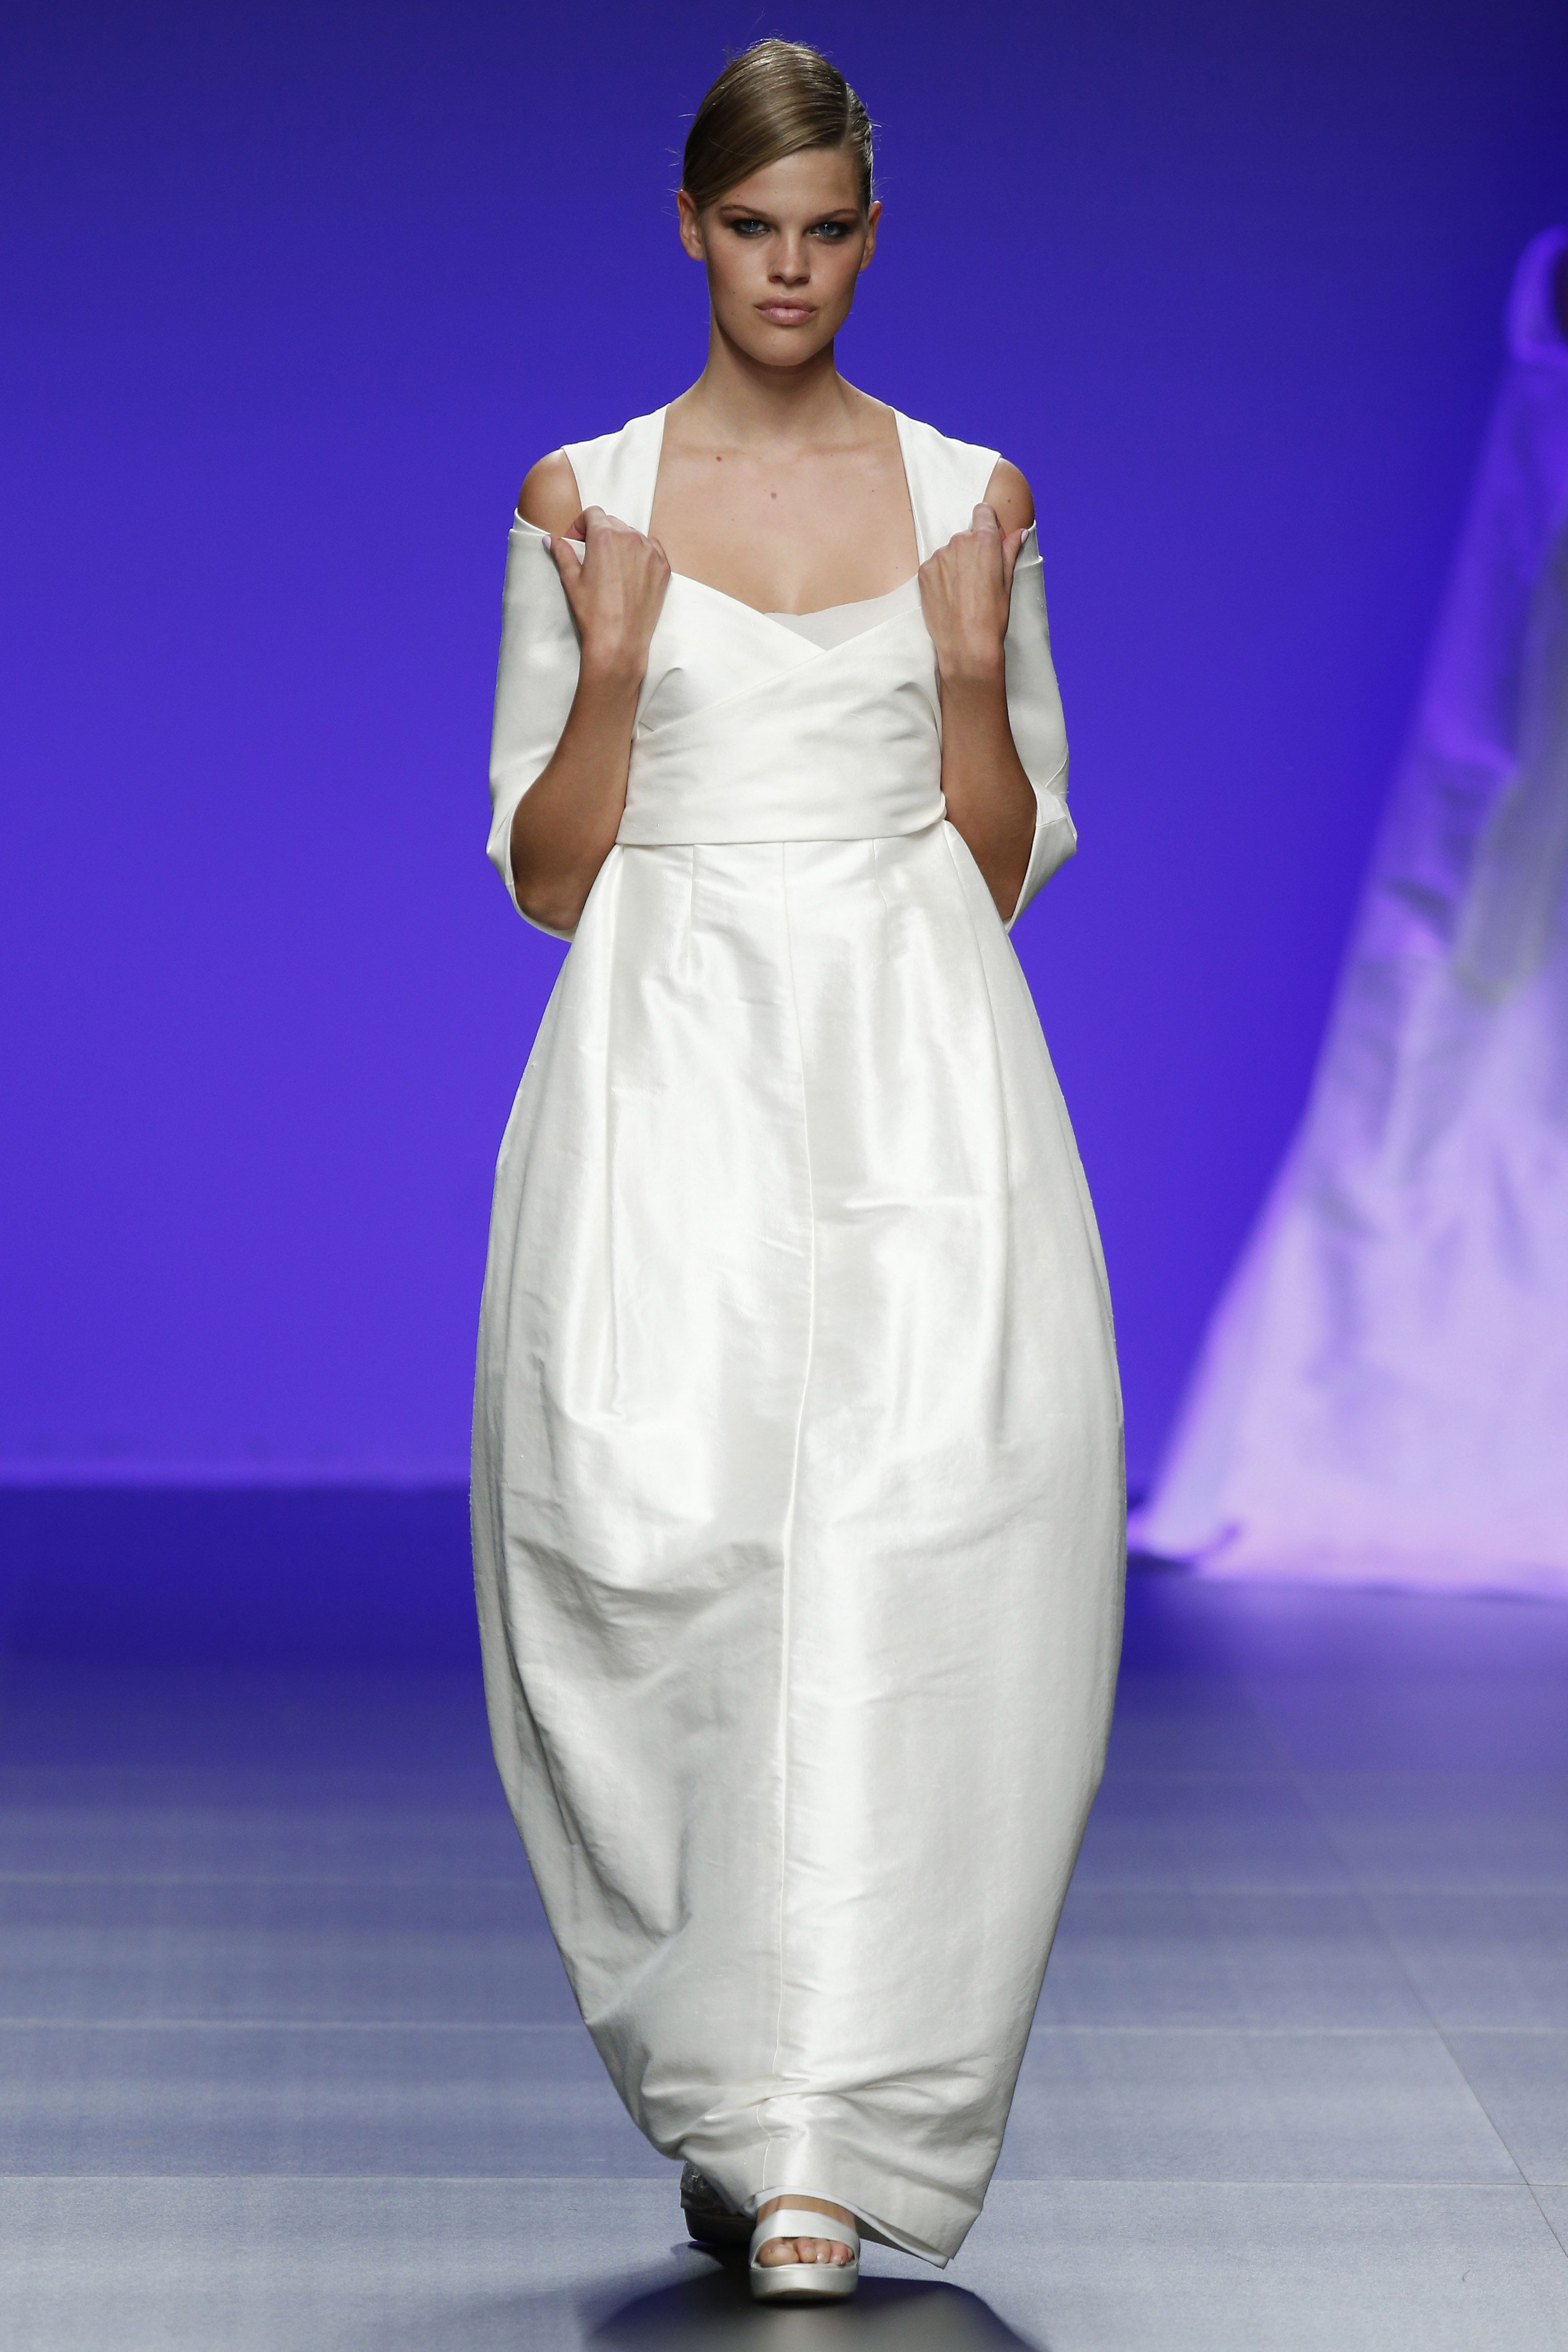 Contemporáneo Boda Vestido Usado Ideas Ornamento Elaboración ...